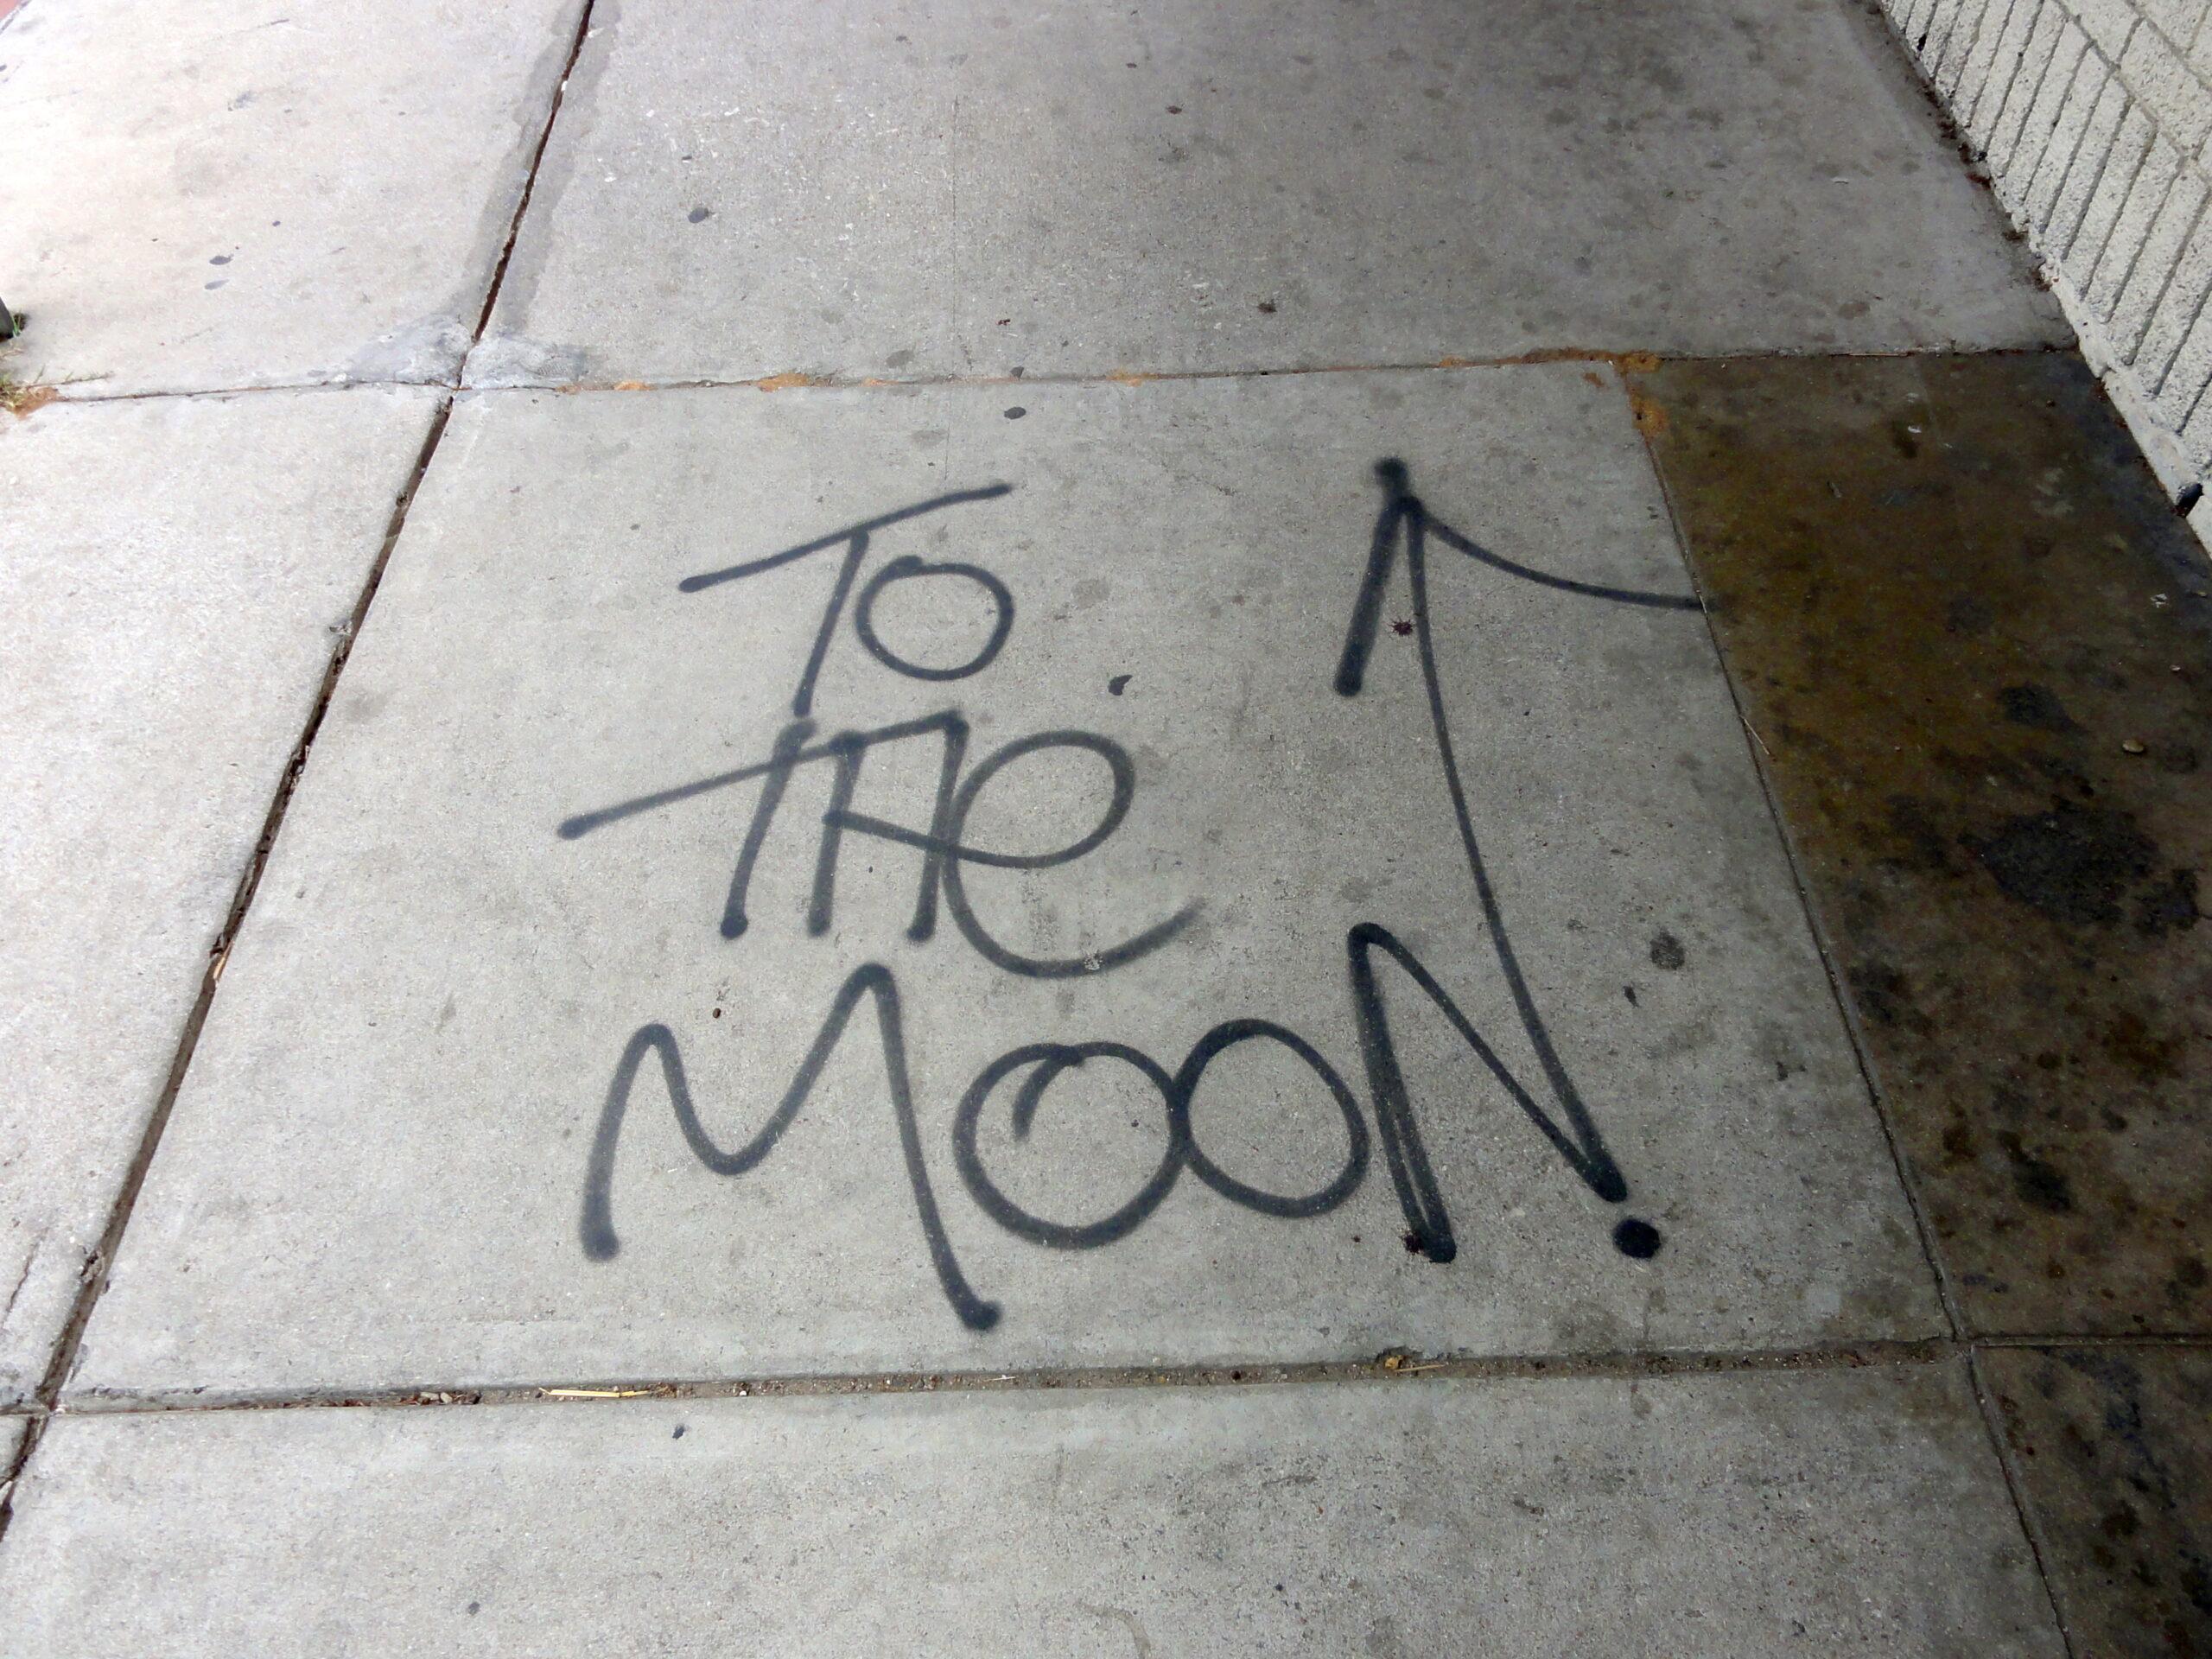 To the Moon Sidewalk